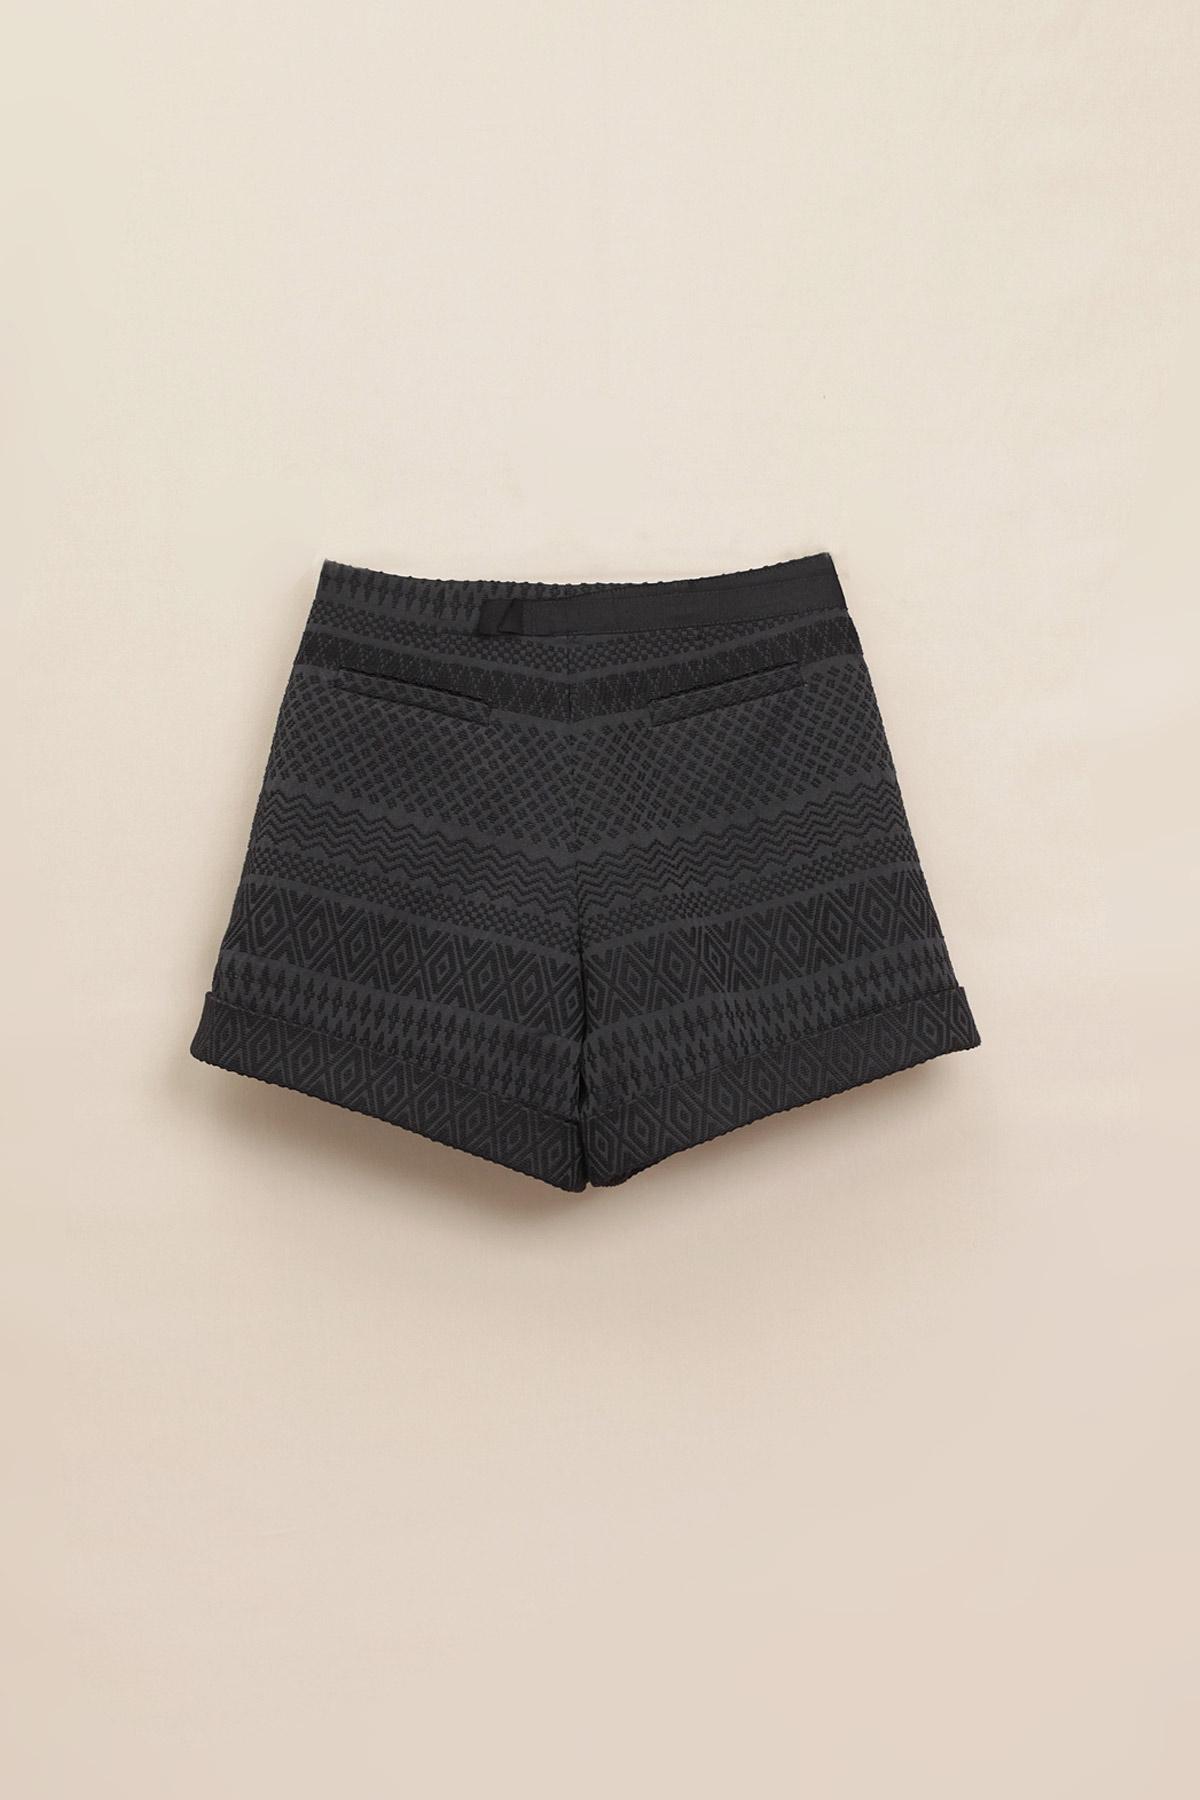 Paula Immich Shorts zum Wickeln aus Jacquardgewebe in schwarz